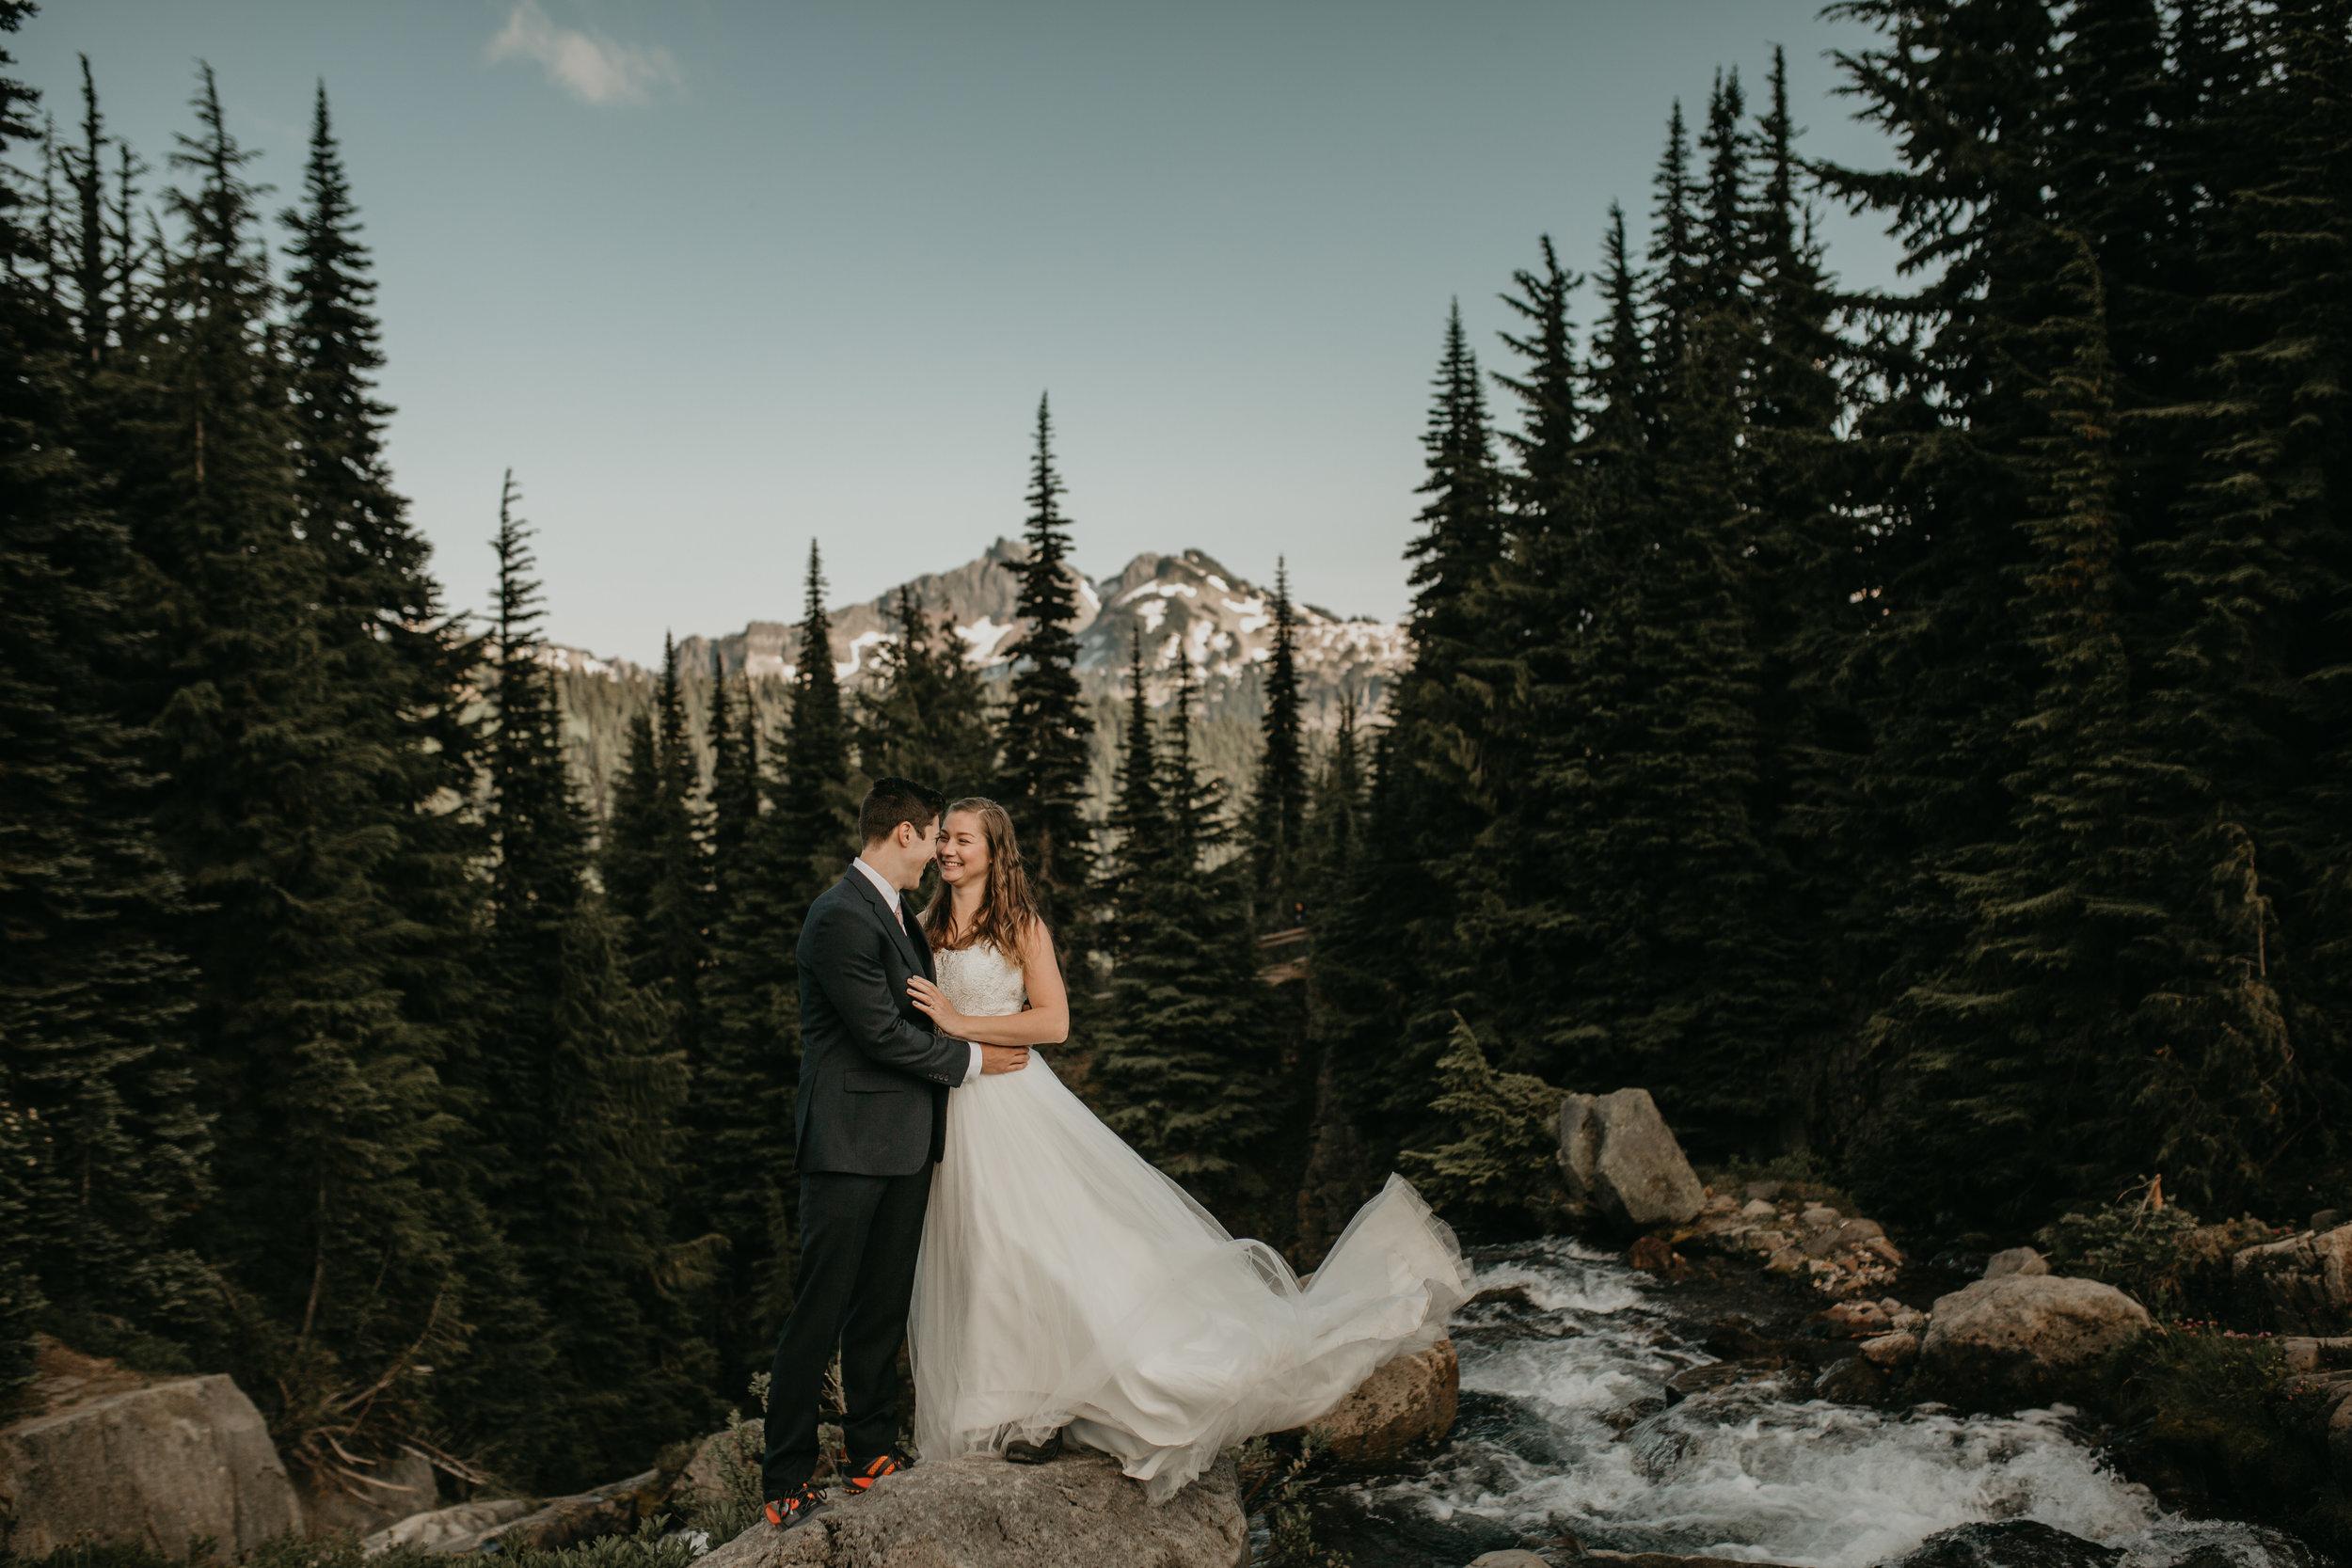 Nicole-Daacke-Photography-Mt-Rainier-elopement-photographer-washington-mountain-epic-wedding-photography-wildflowers-at-rainier-pine-tree-cloudy-summer-day-at-mountain-rainier-17.jpg